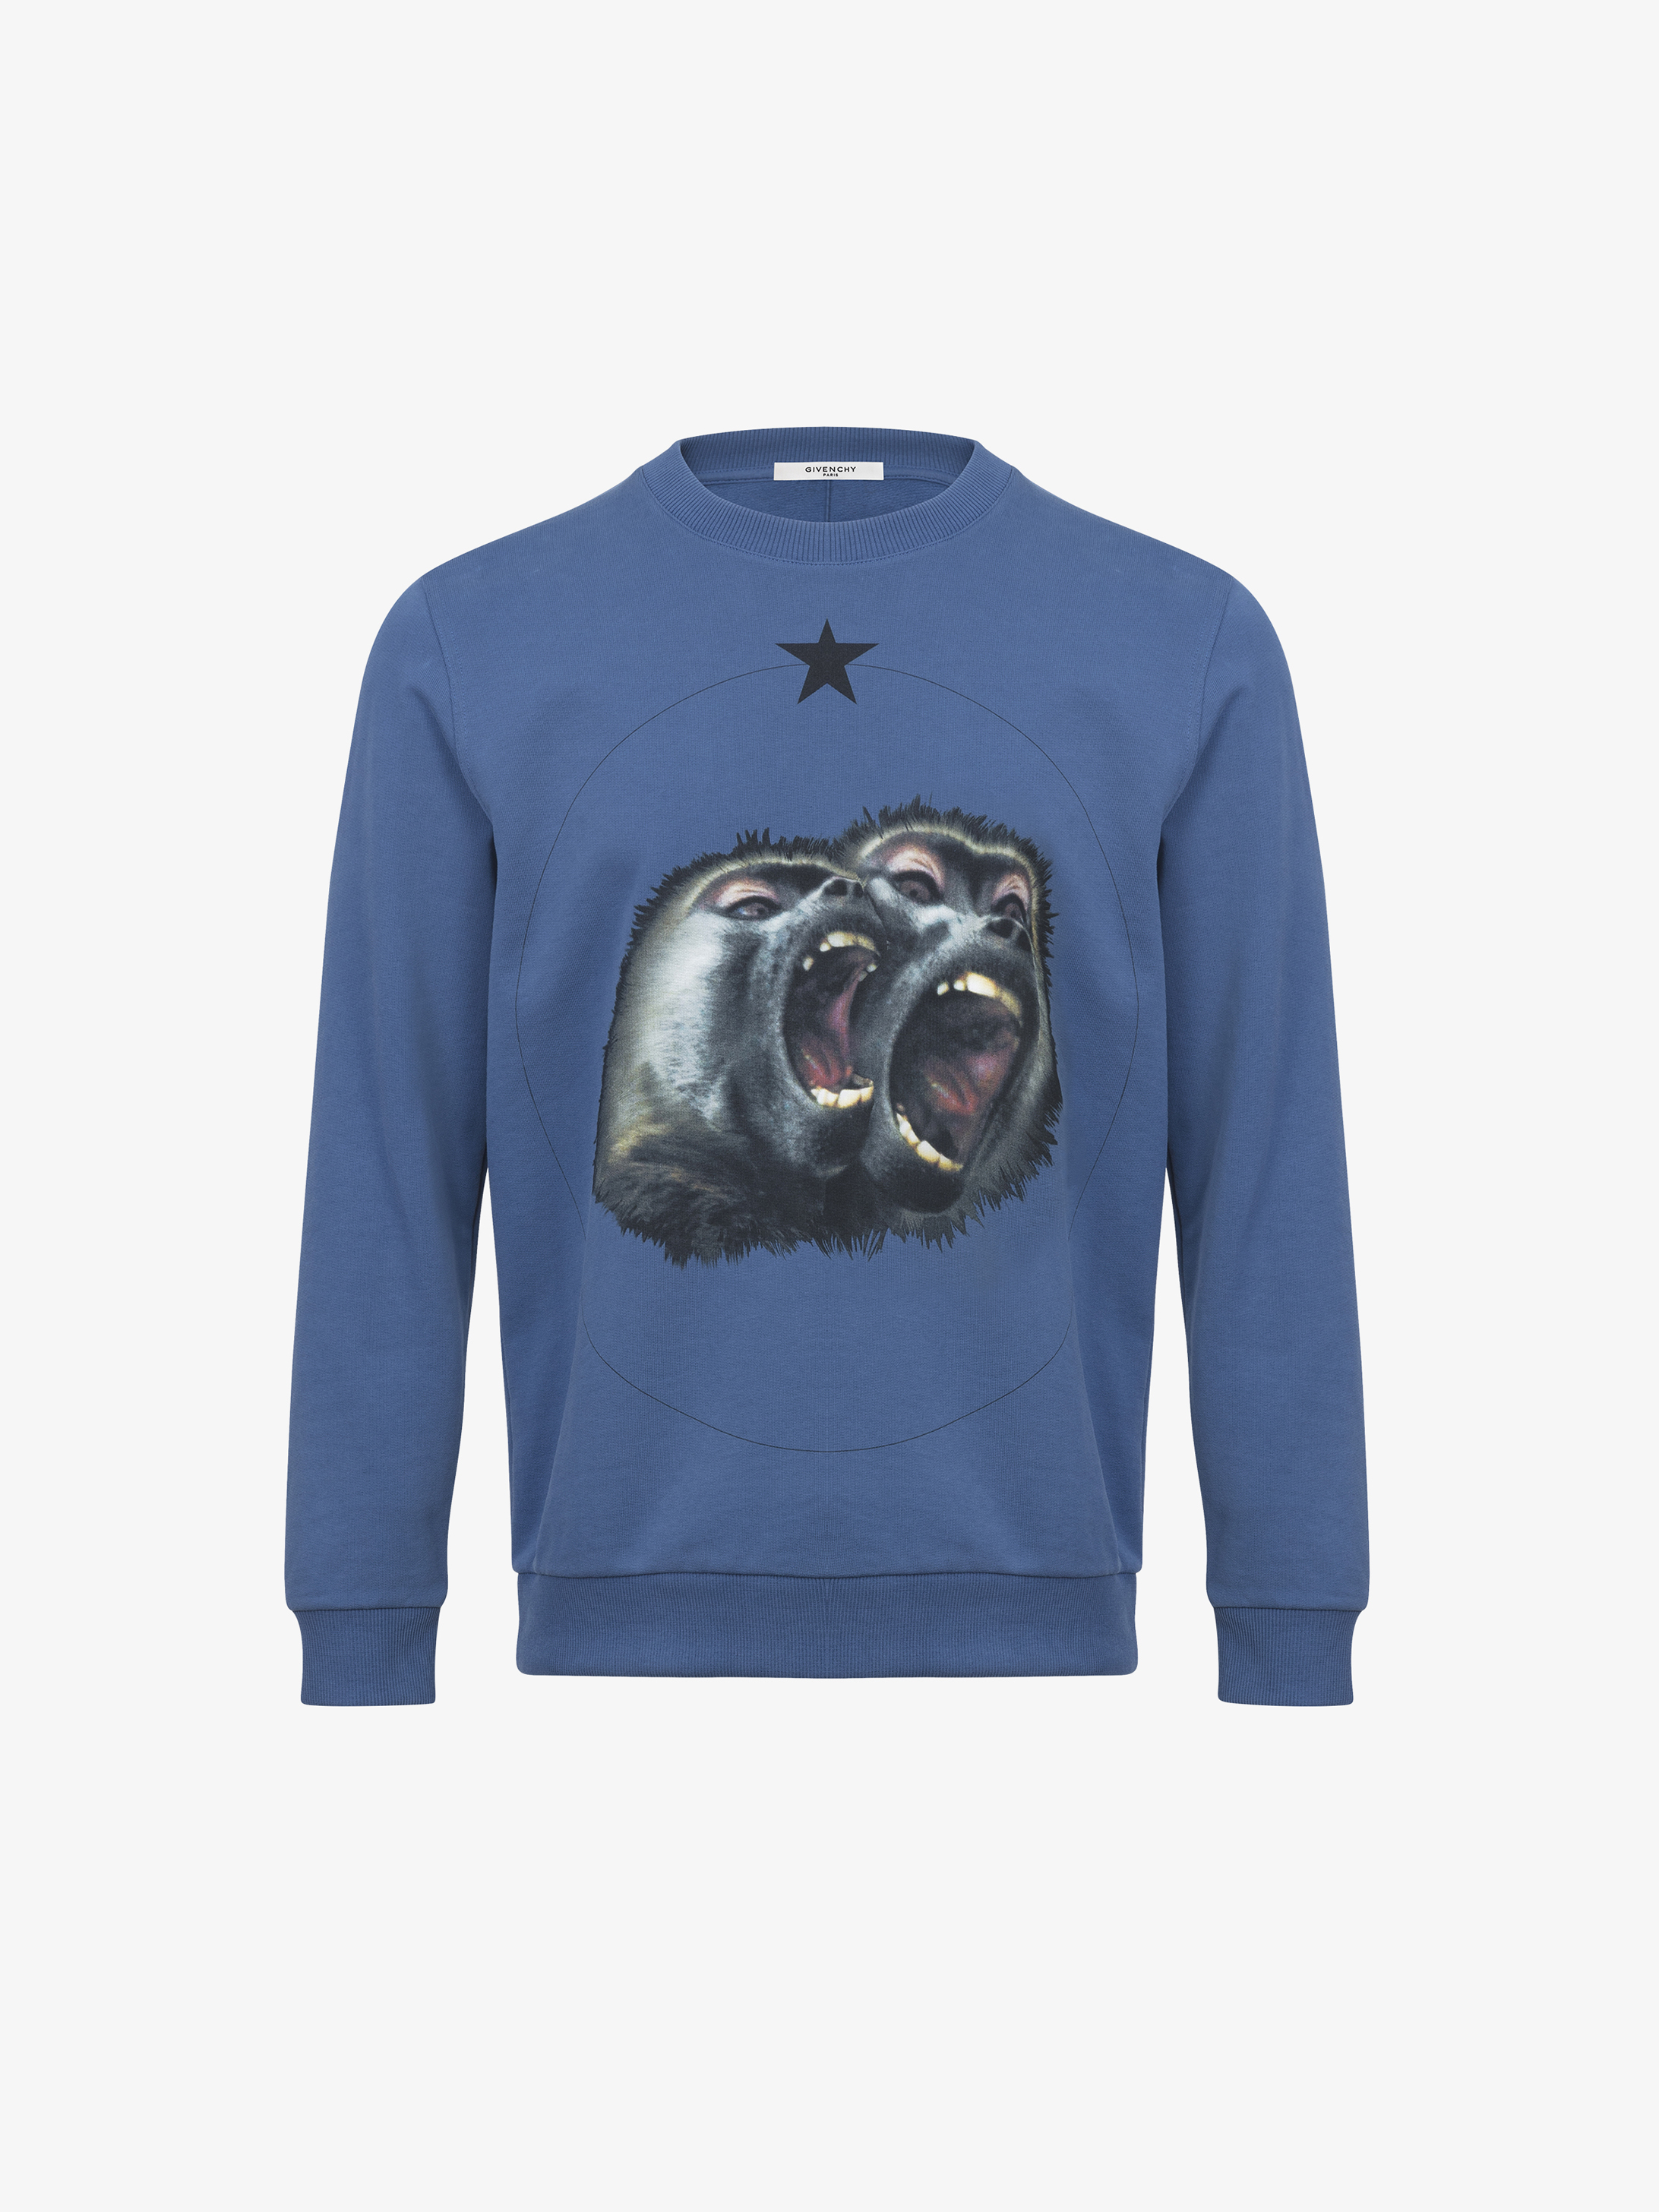 Sweatshirt imprimé Monkey Brothers